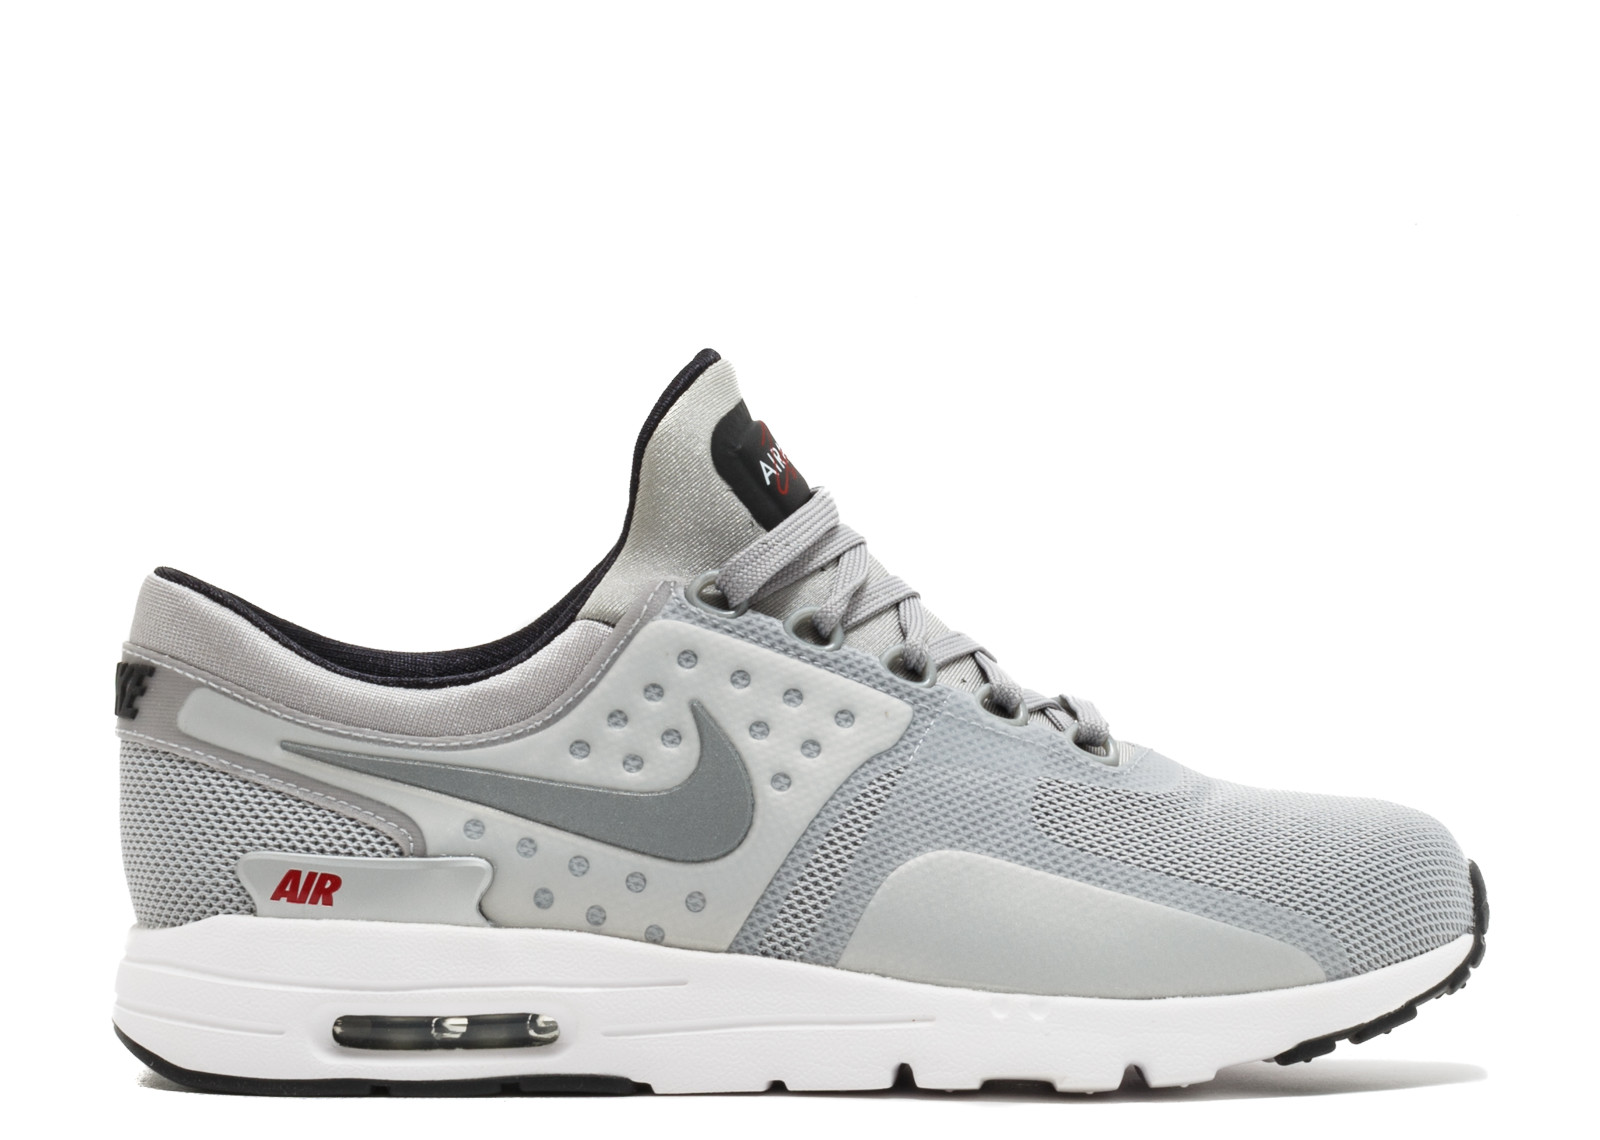 online store e1be3 d925b W Nike Air Max Zero Qs 'Silver Bullet' - 863700-002 - Size W5.5